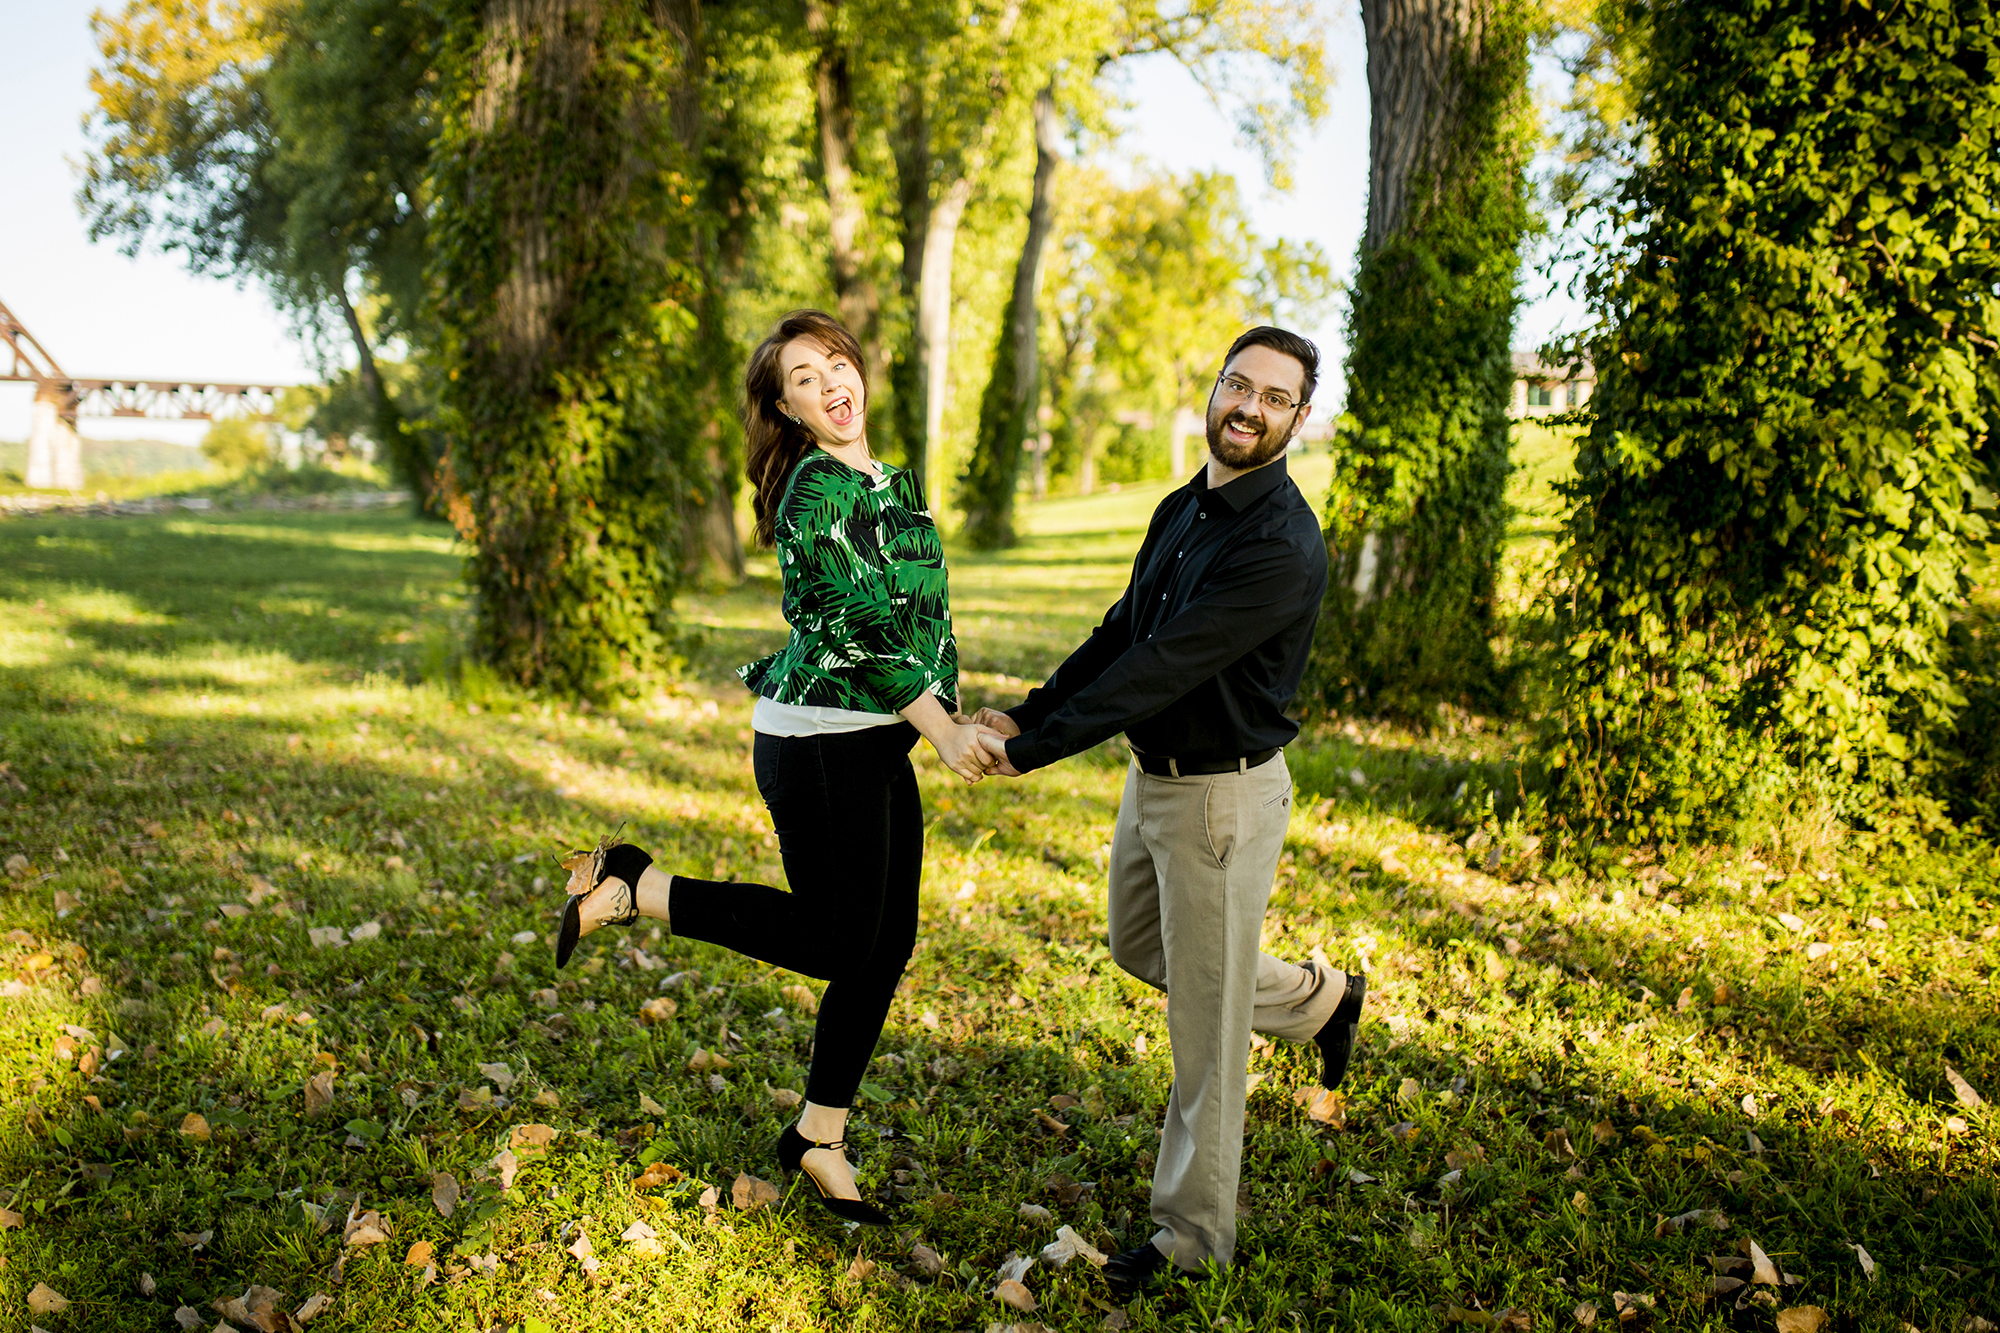 Seriously_Sabrina_Photography_Louisville_Kentucky_Engagement_Falls_of_Ohio_Seneca_Park_KarlMarlie62.jpg